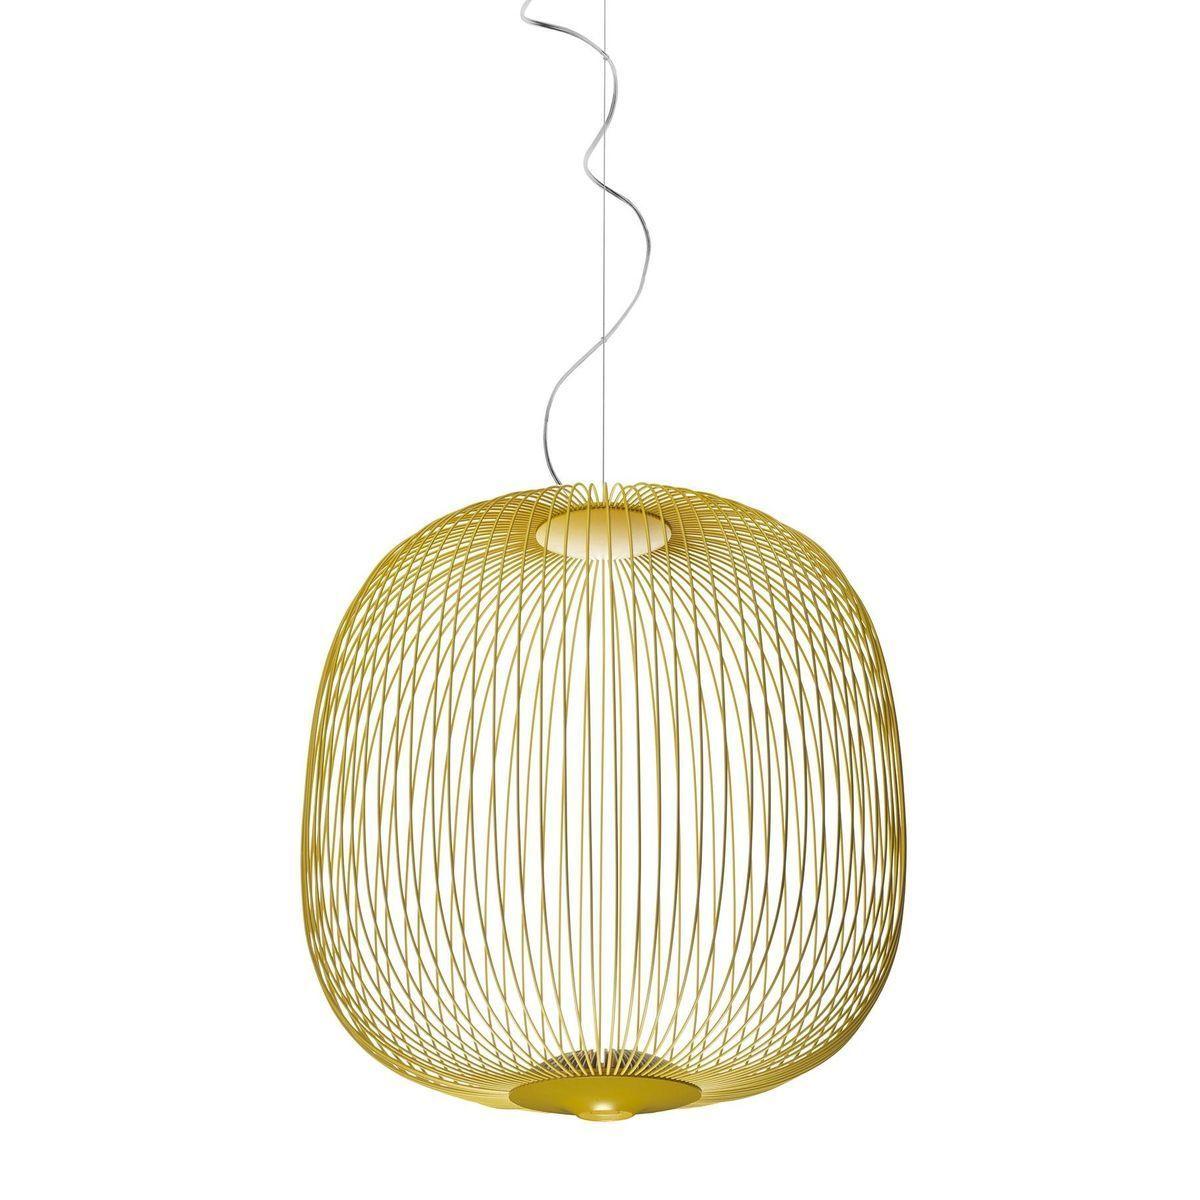 spokes  led suspension lamp  foscarini  ambientedirectcom - foscarini  spokes  led suspension lamp  goldenyellowdimableklm